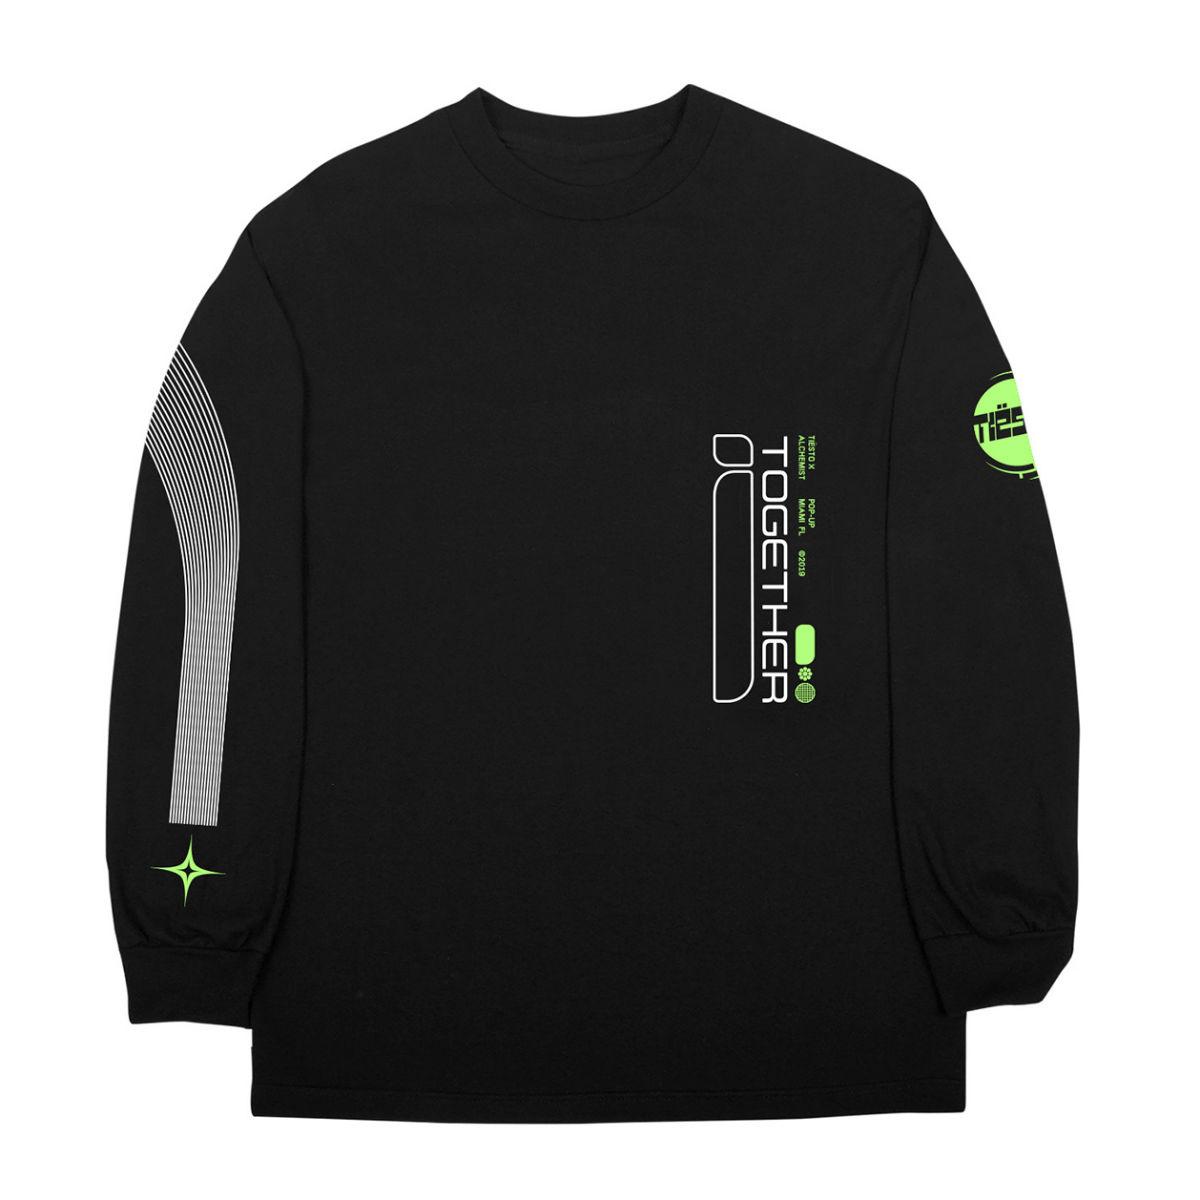 Secrets LS T-Shirt - Black